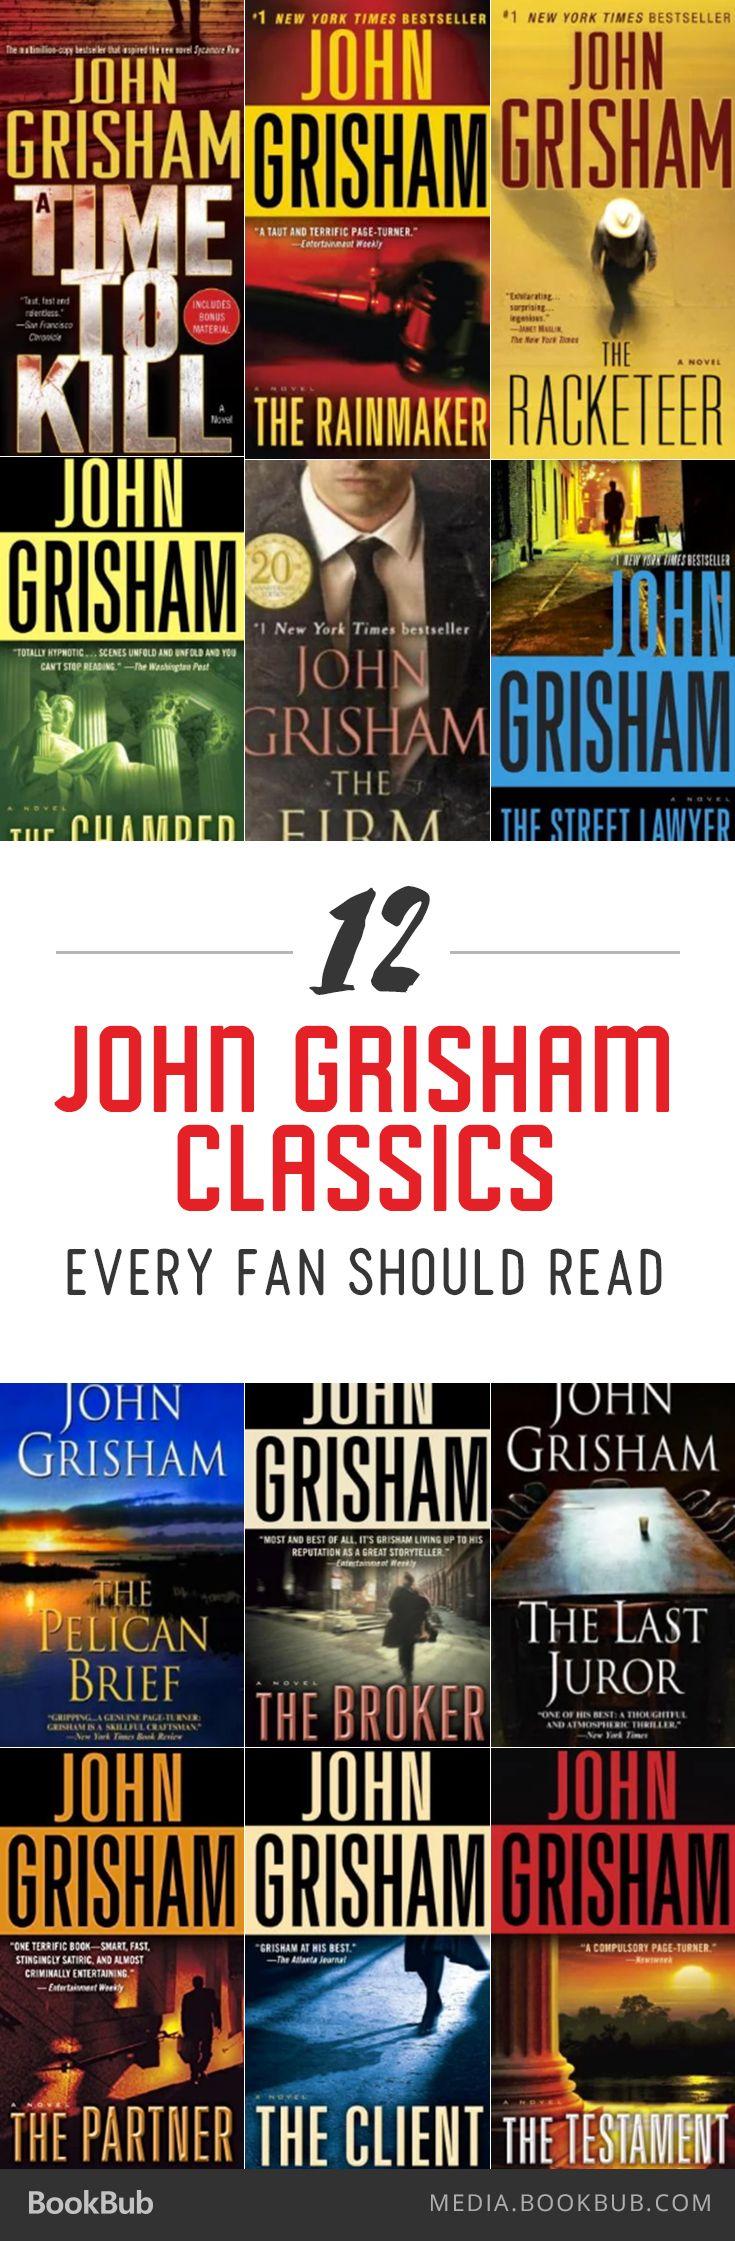 12 gripping John Grisham classics that every fan should read.